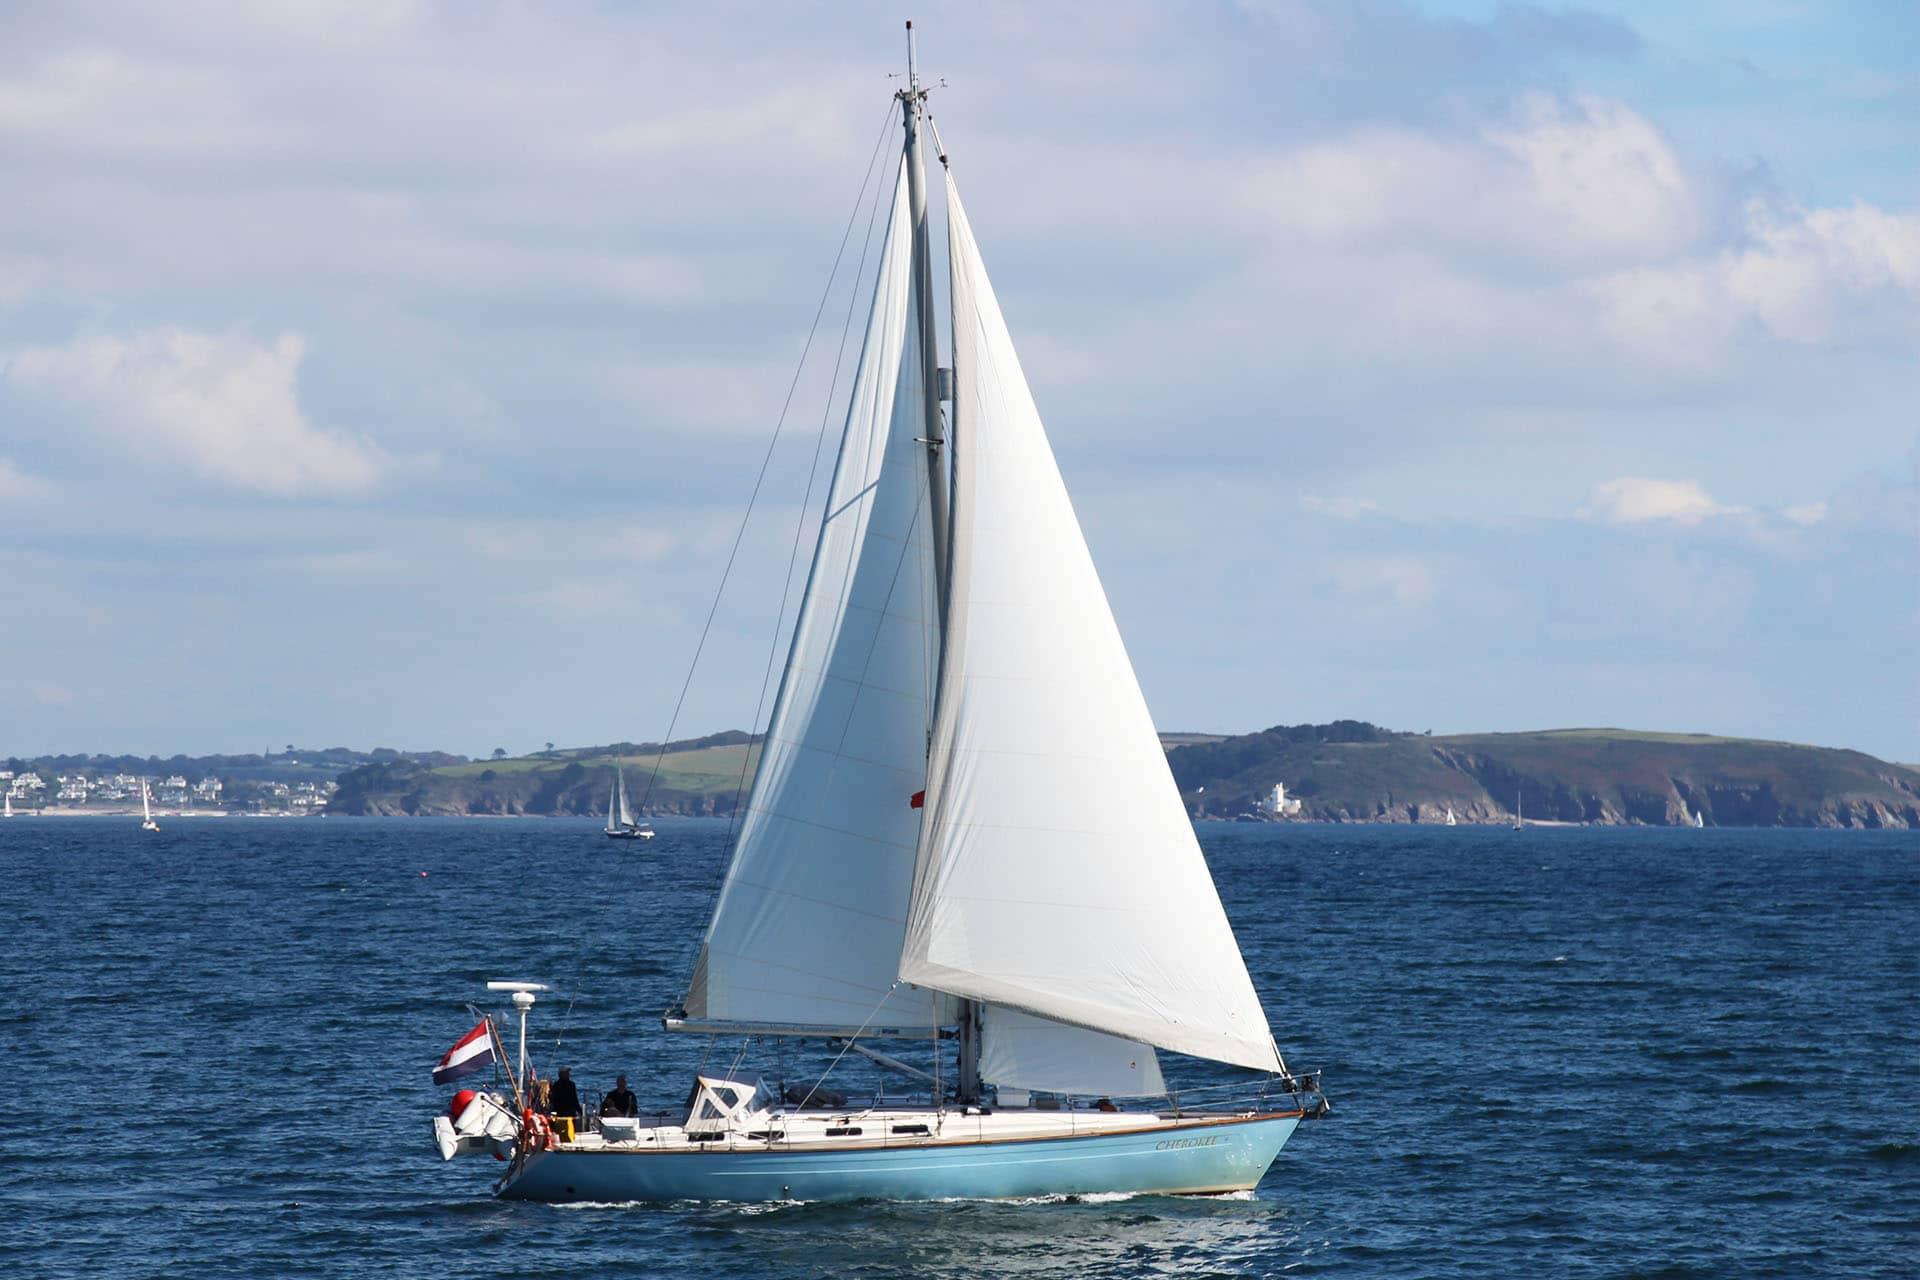 Cherokee under full sail